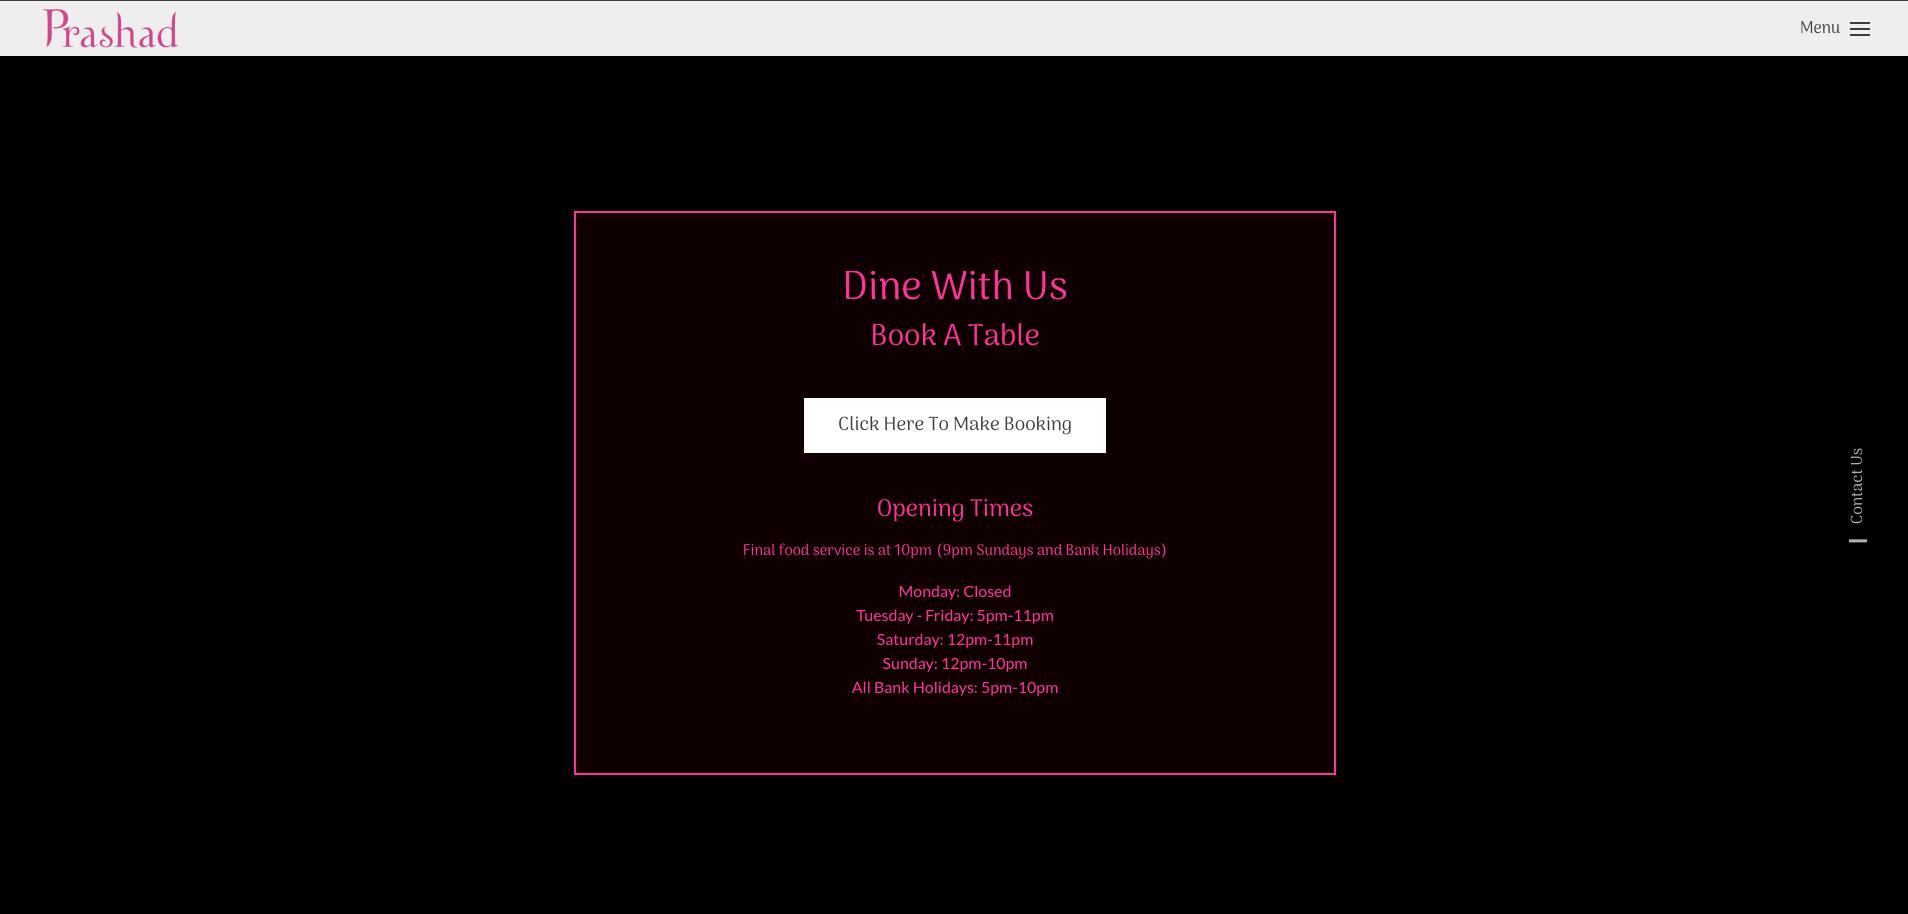 Book a table at Prashad website design